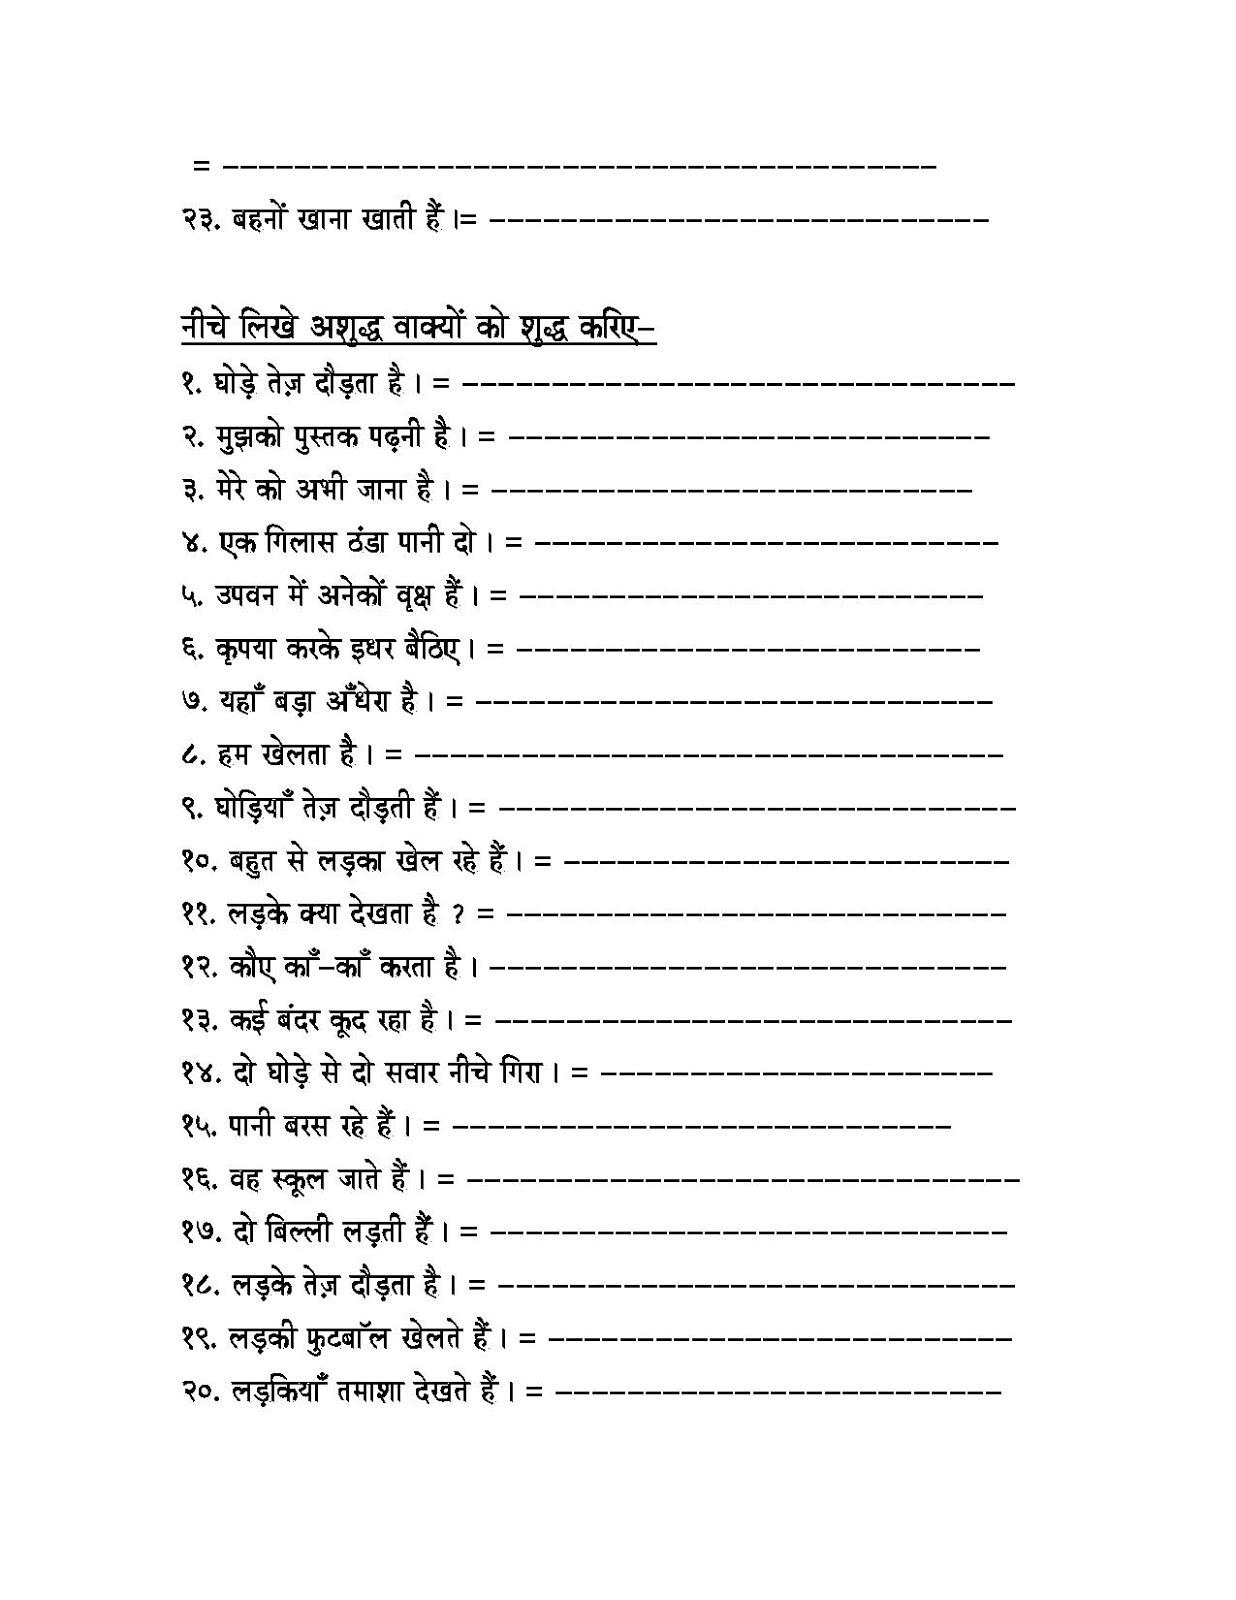 67 English Grammar Worksheets For Grade 2 Icse, Worksheets Grade - Free Printable Hindi Comprehension Worksheets For Grade 3